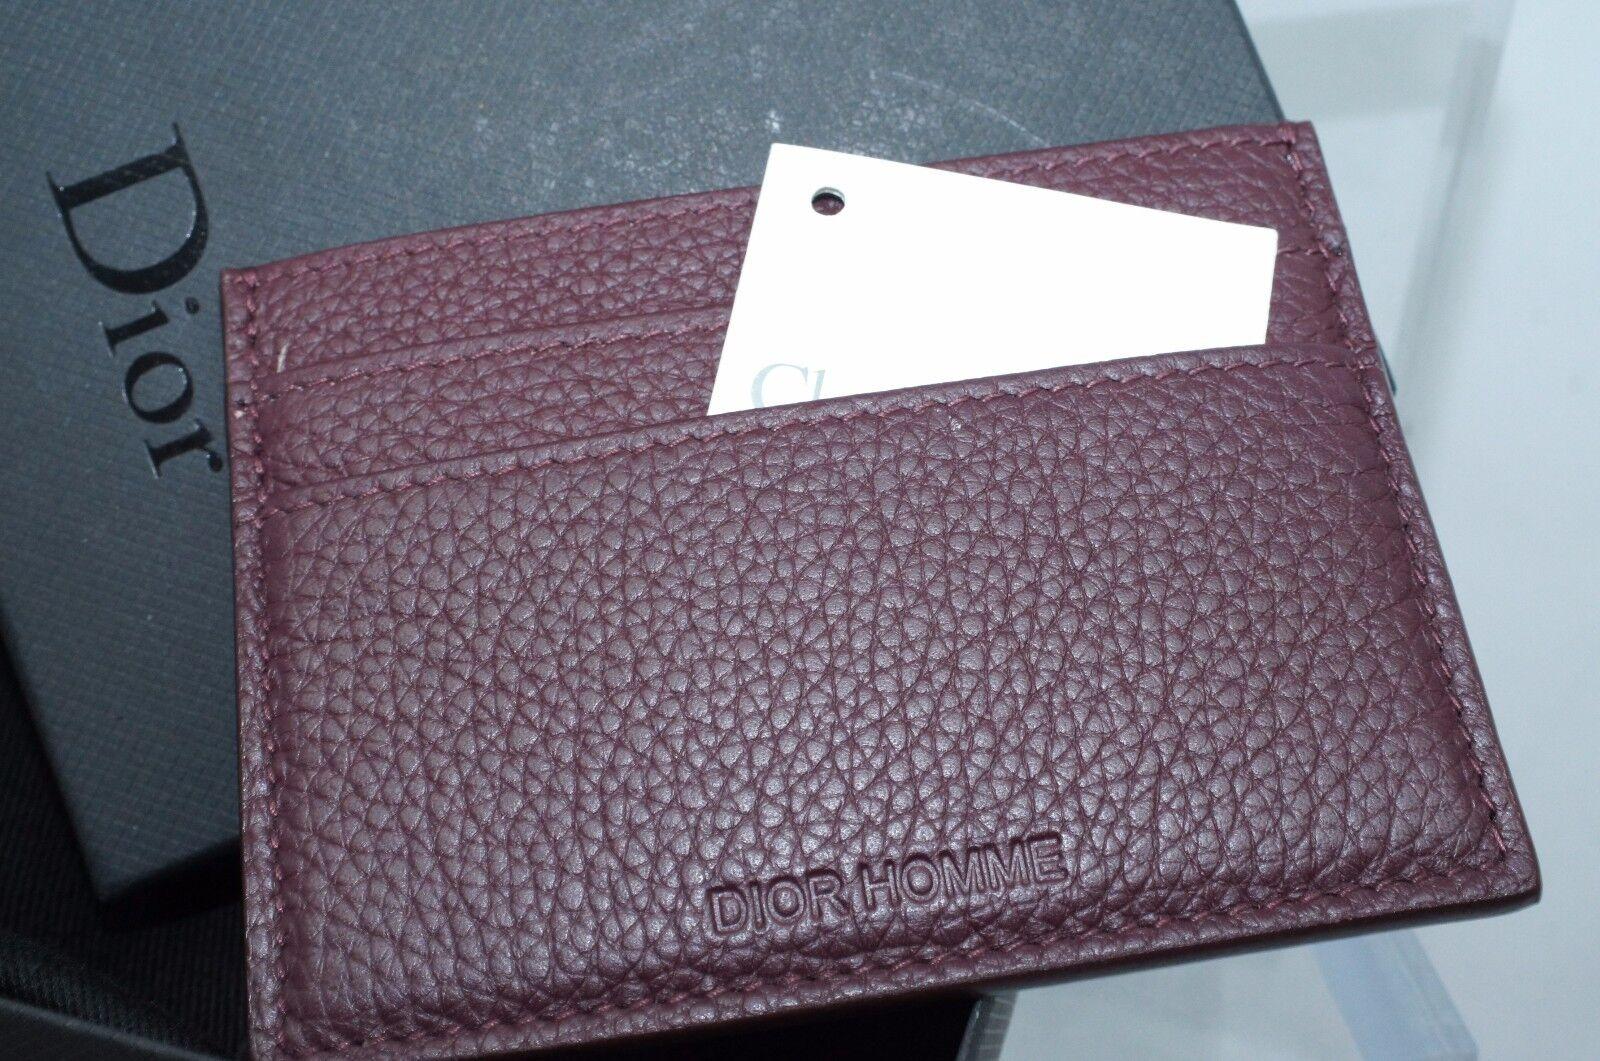 66df224d07 Christian Dior Men's Wallet Credit Card Case Money CC Holder Leather ...